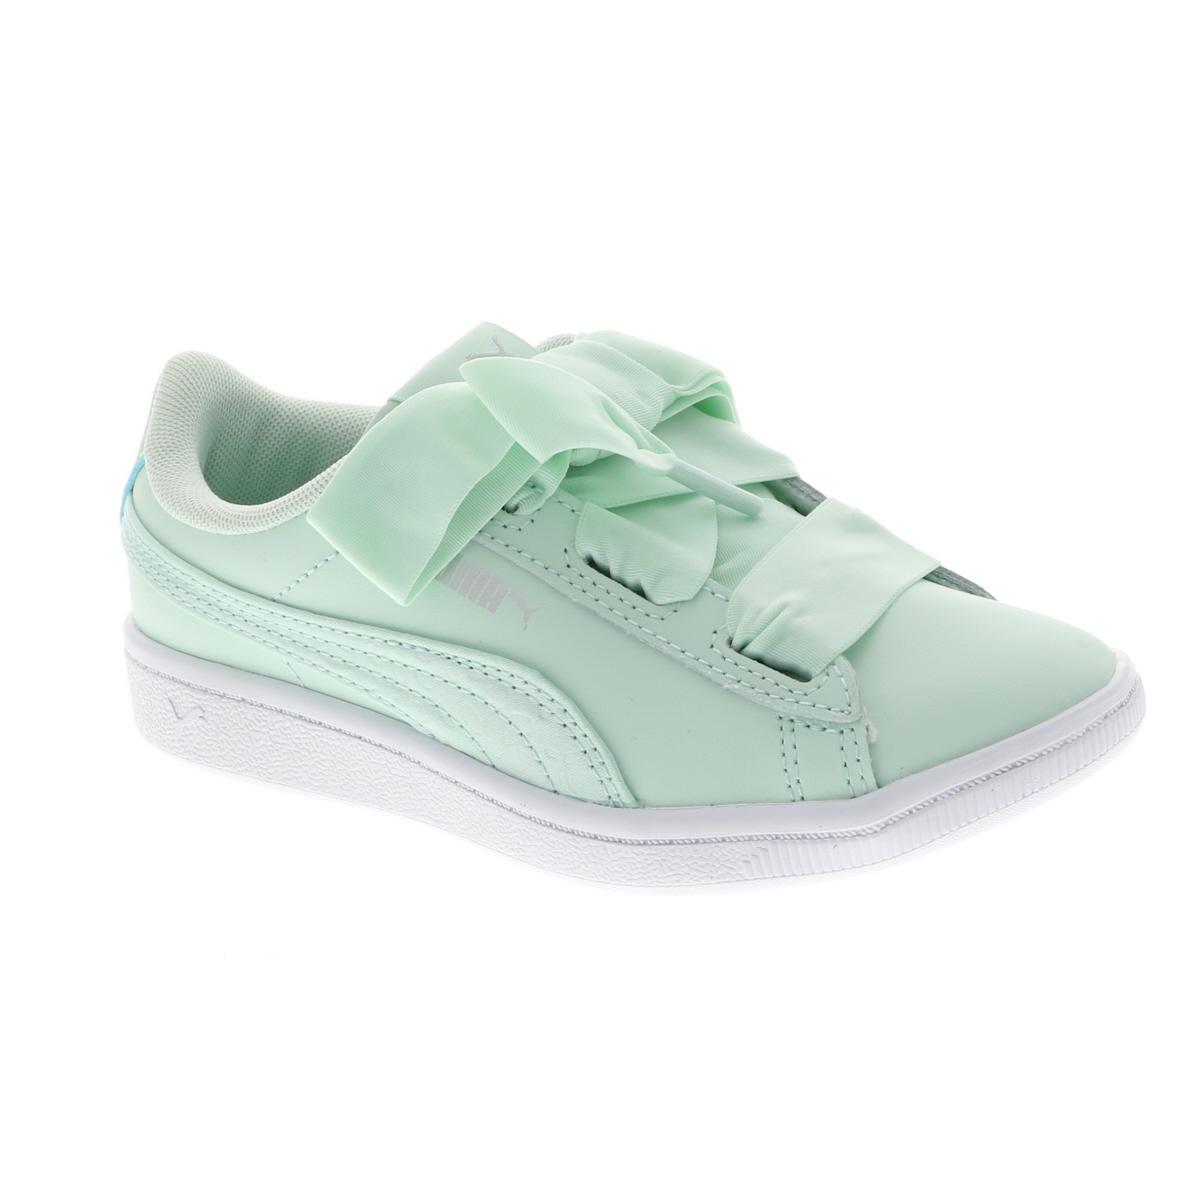 191106d1ac2 Puma. Sneakers. Puma Sneakers. - Kleur: roze ...